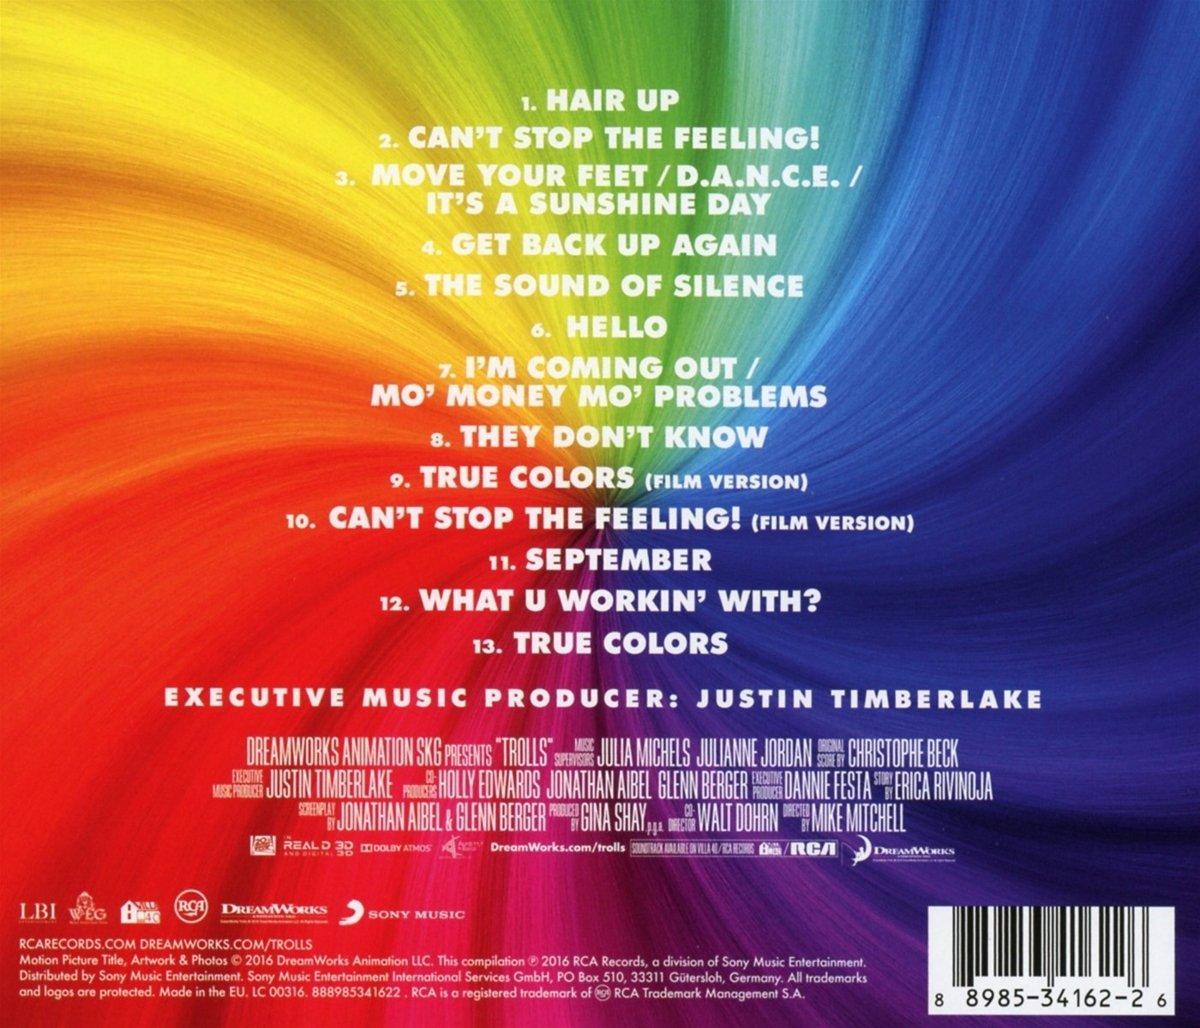 Original Motion Picture Soundtrack - TROLLS (Original Motion Picture Soundtrack) - Amazon.com Music